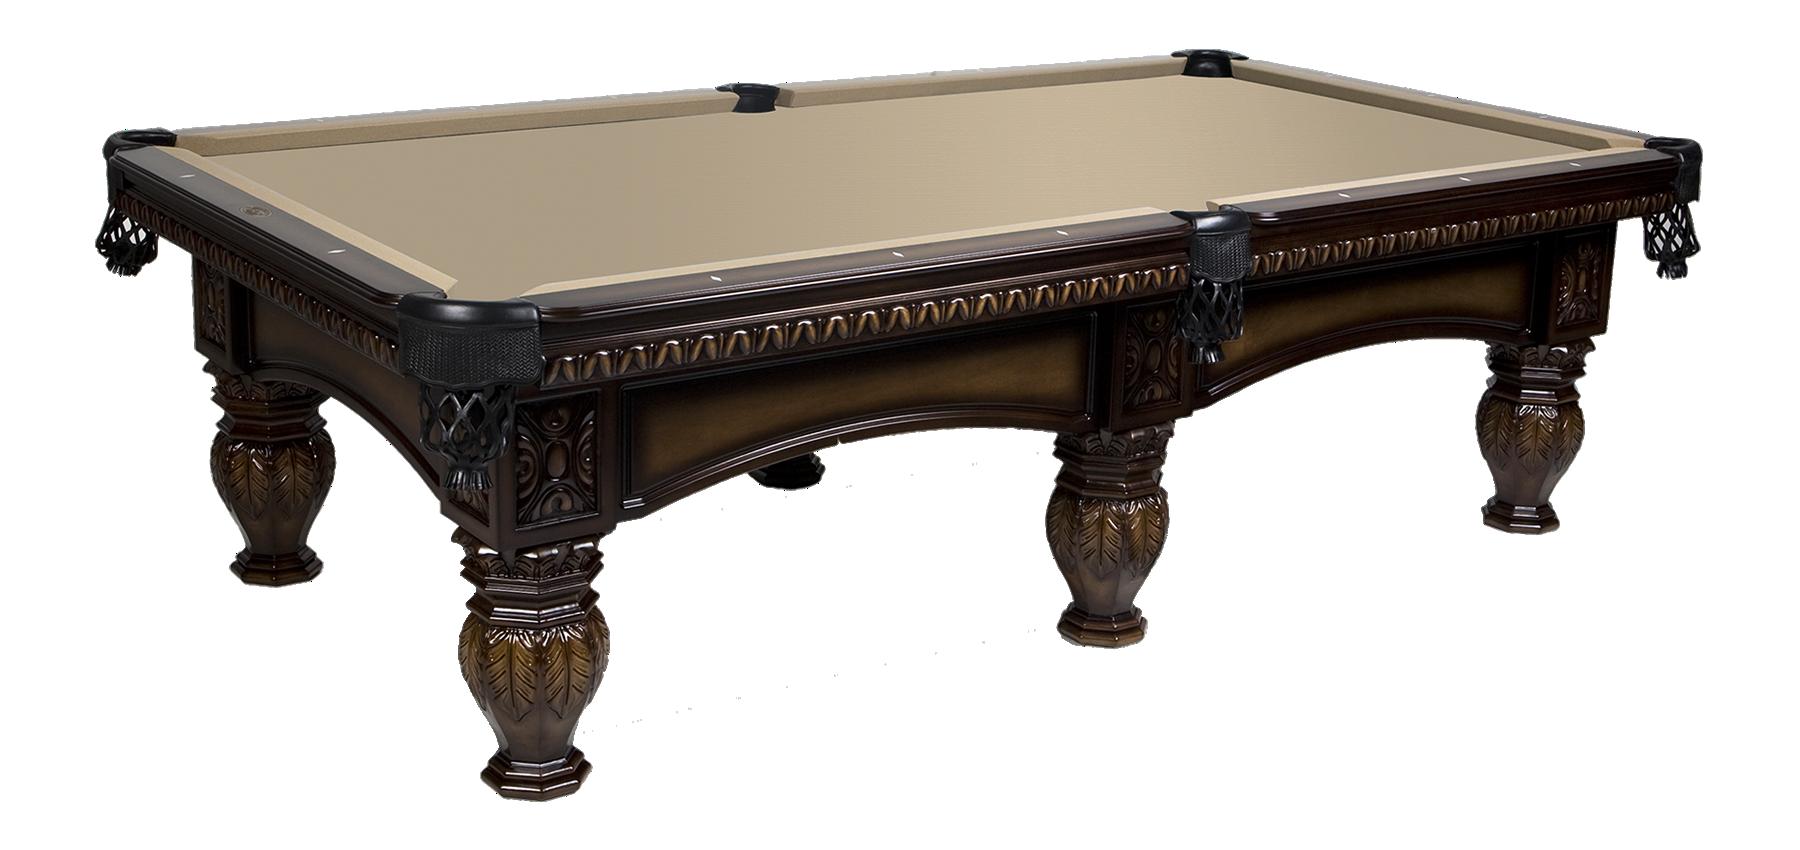 Blattbilliards Com Handcrafted Semicustom Venbol Php Pool Table Billiards Olhausen Pool Table